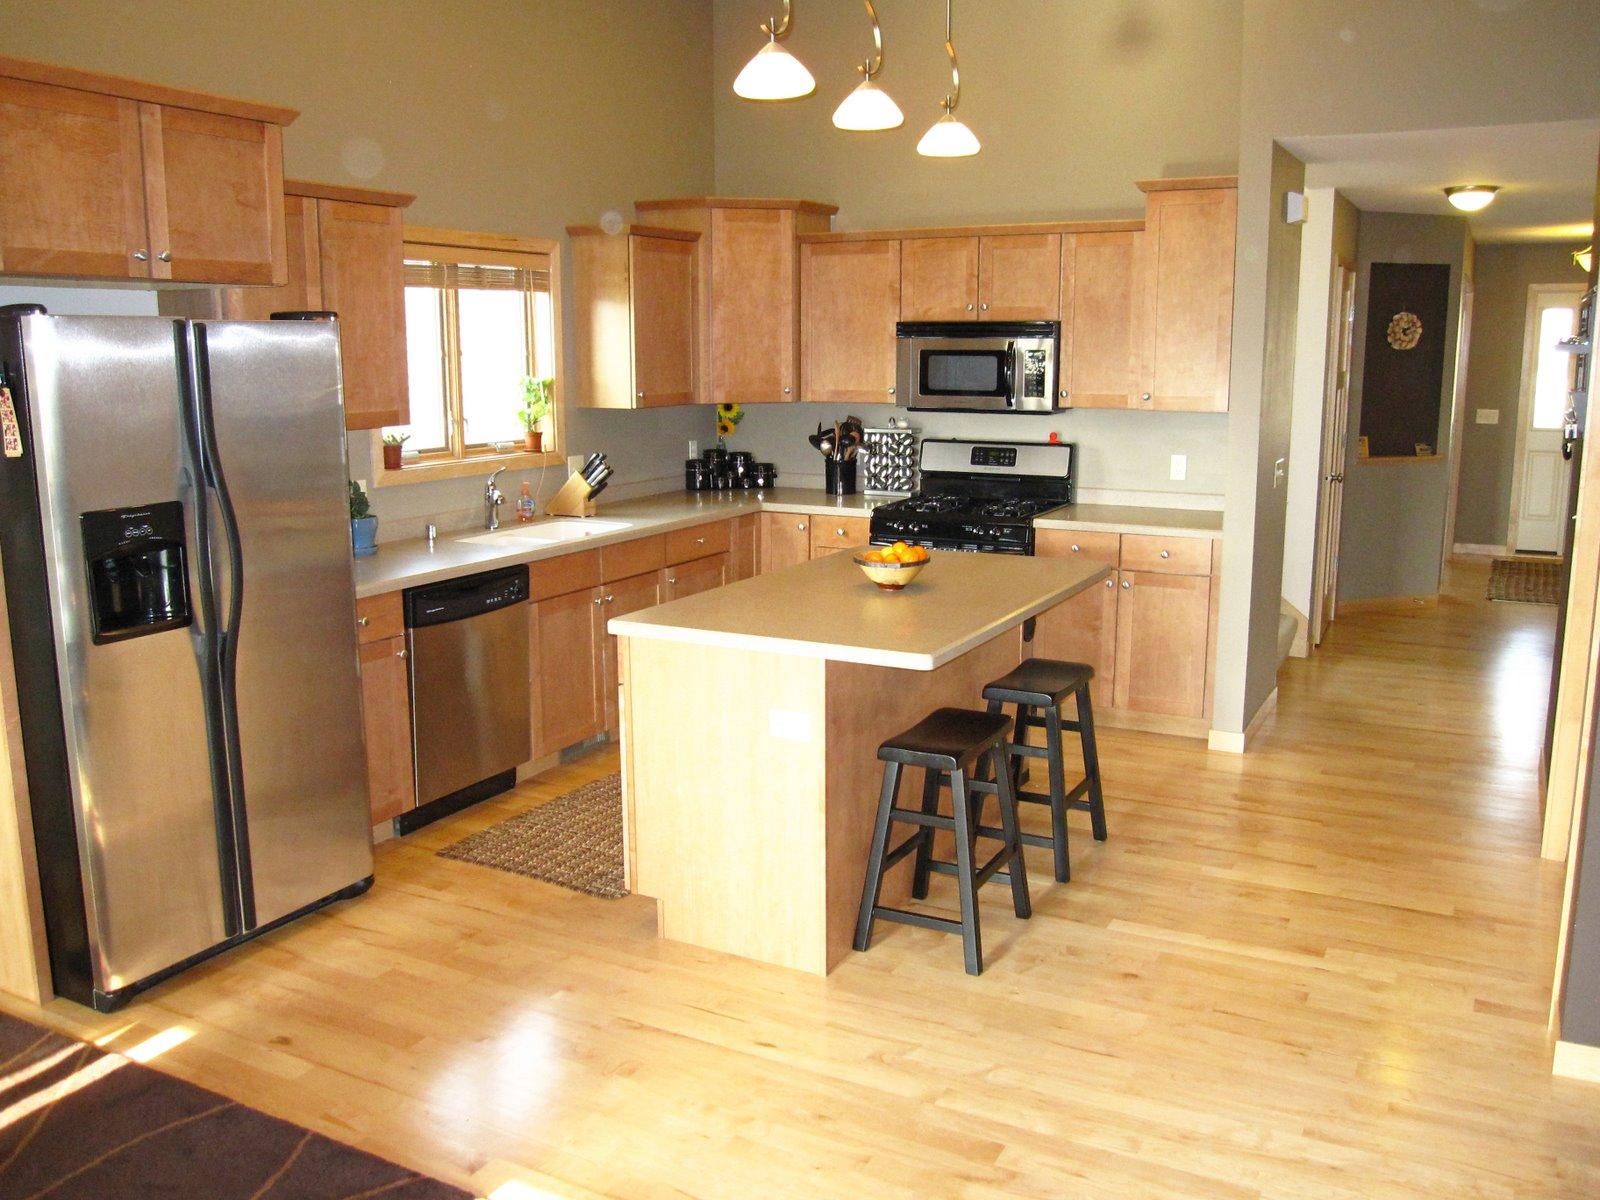 Light Maple Cabinets With Hardwood Floors